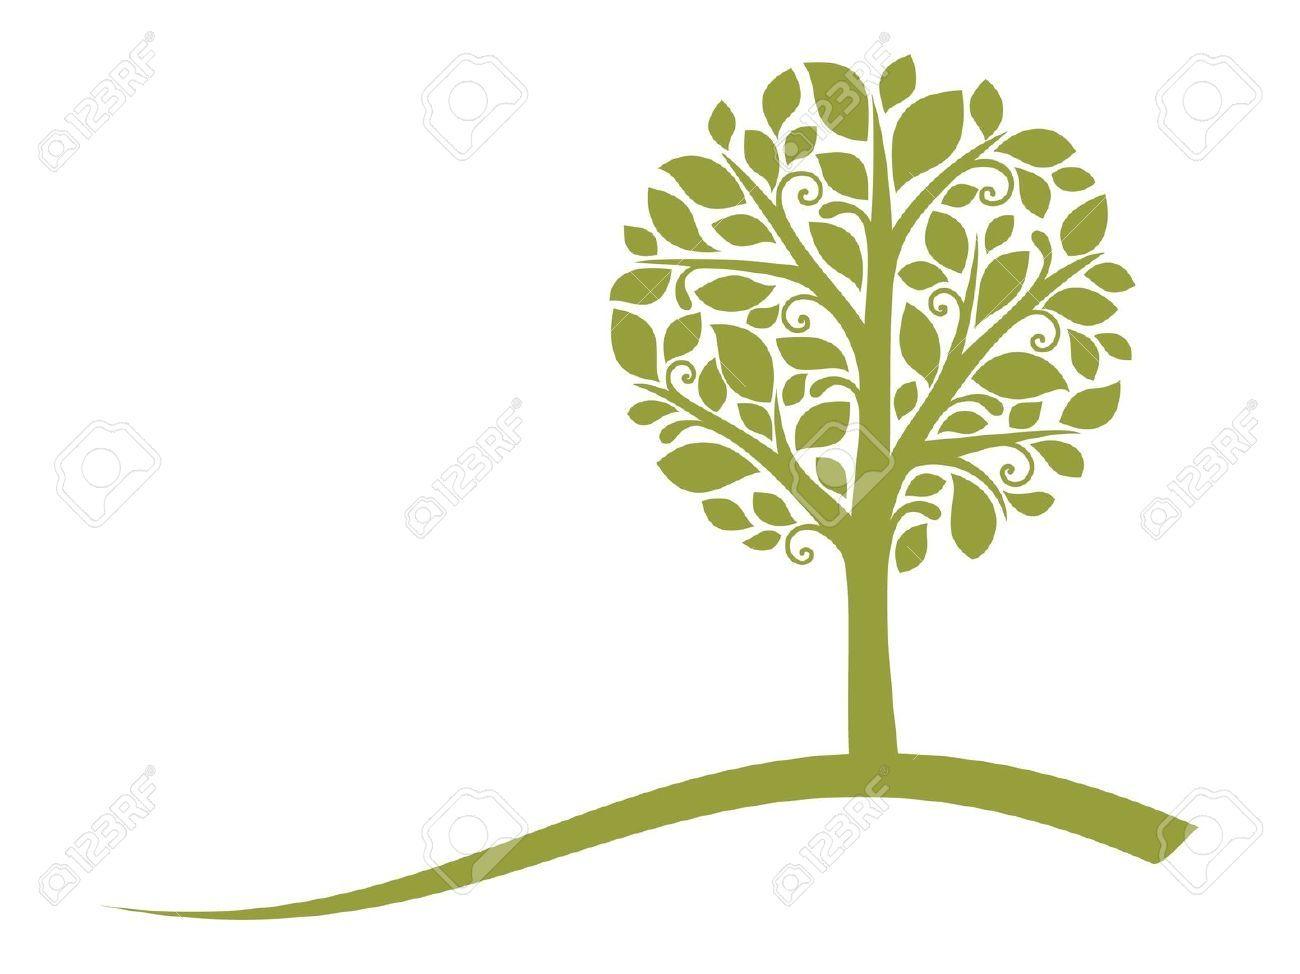 Image result for free tree logo clipart | Logos | Pinterest | Tree ...